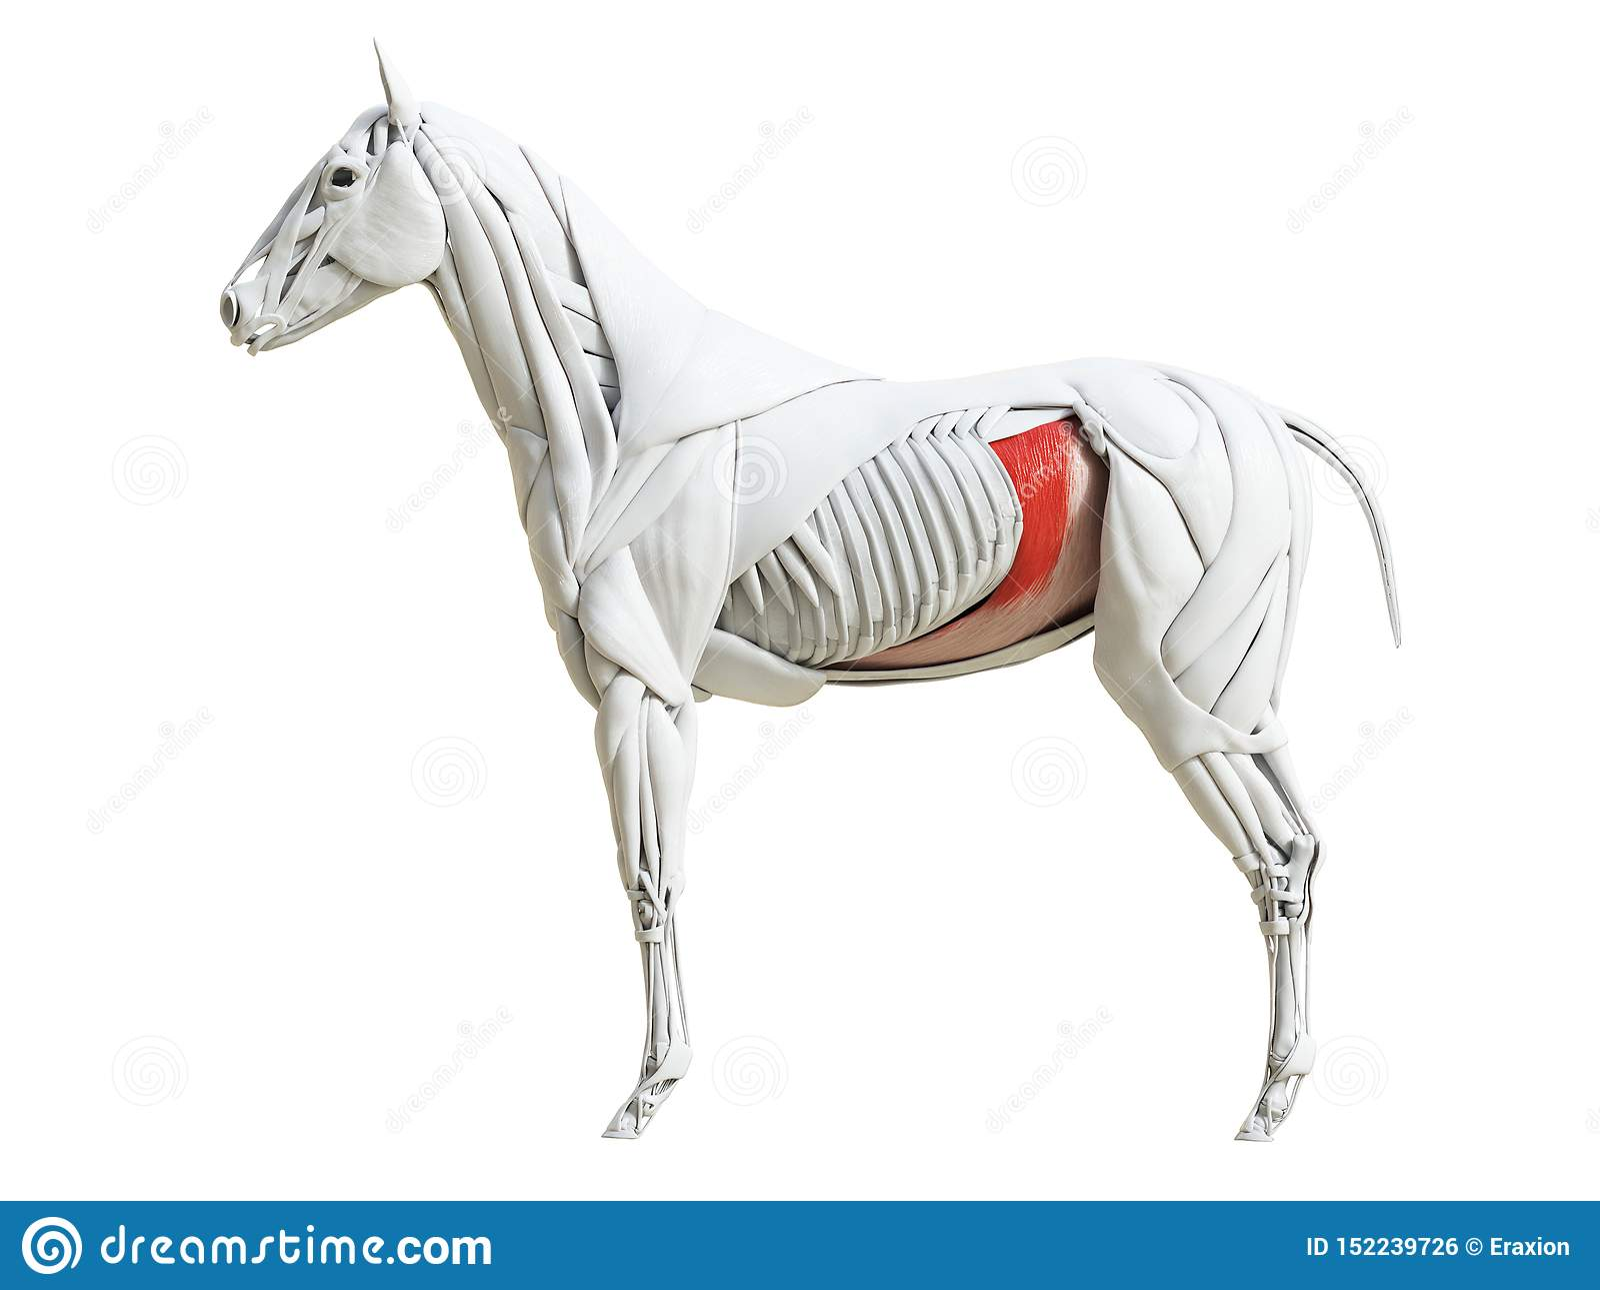 Equine анатомия мышцы - transversus abdominis